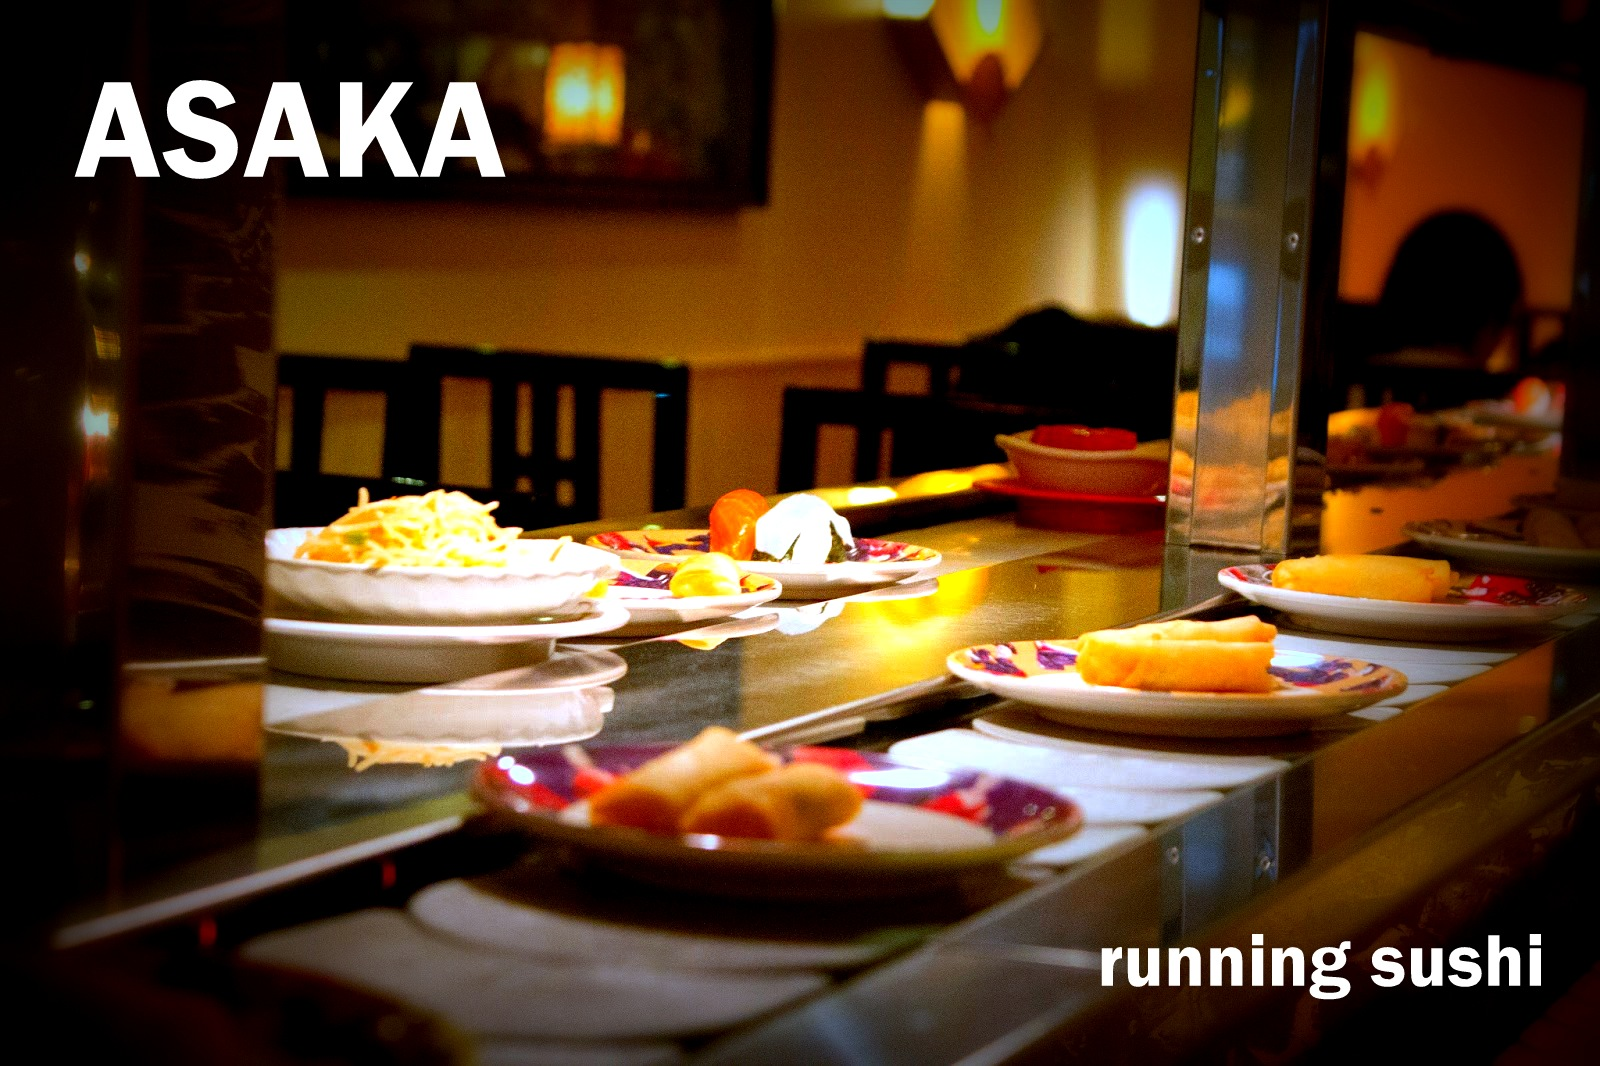 Ben 39 s food hut nenea v plac pe tele for Asaka japanese cuisine